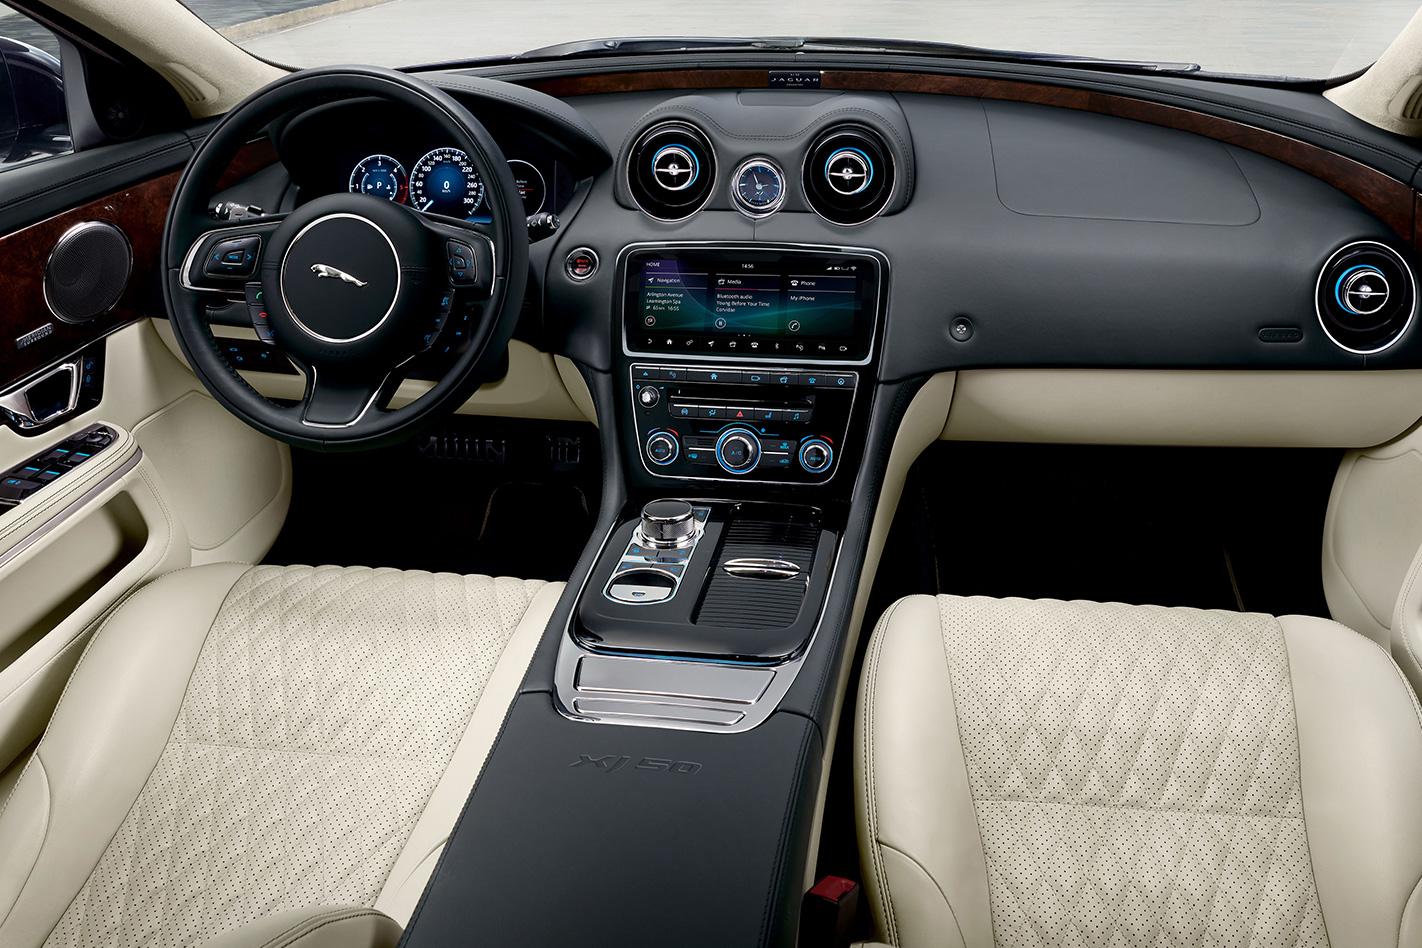 2019 Jaguar Xj50 Special Edition Revealed